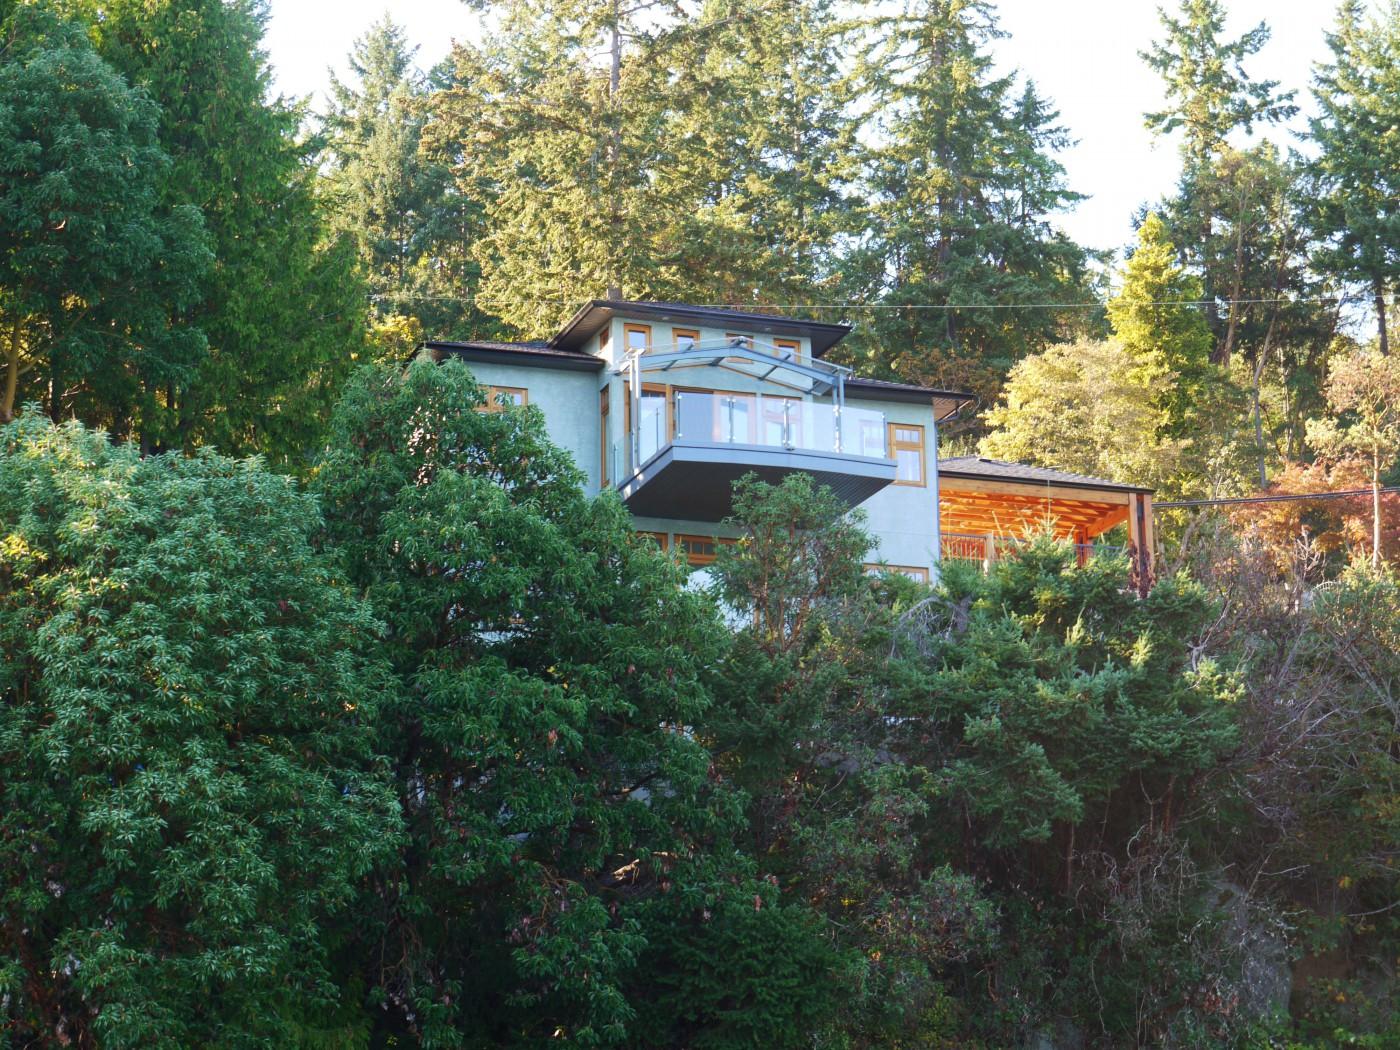 house on cliffside